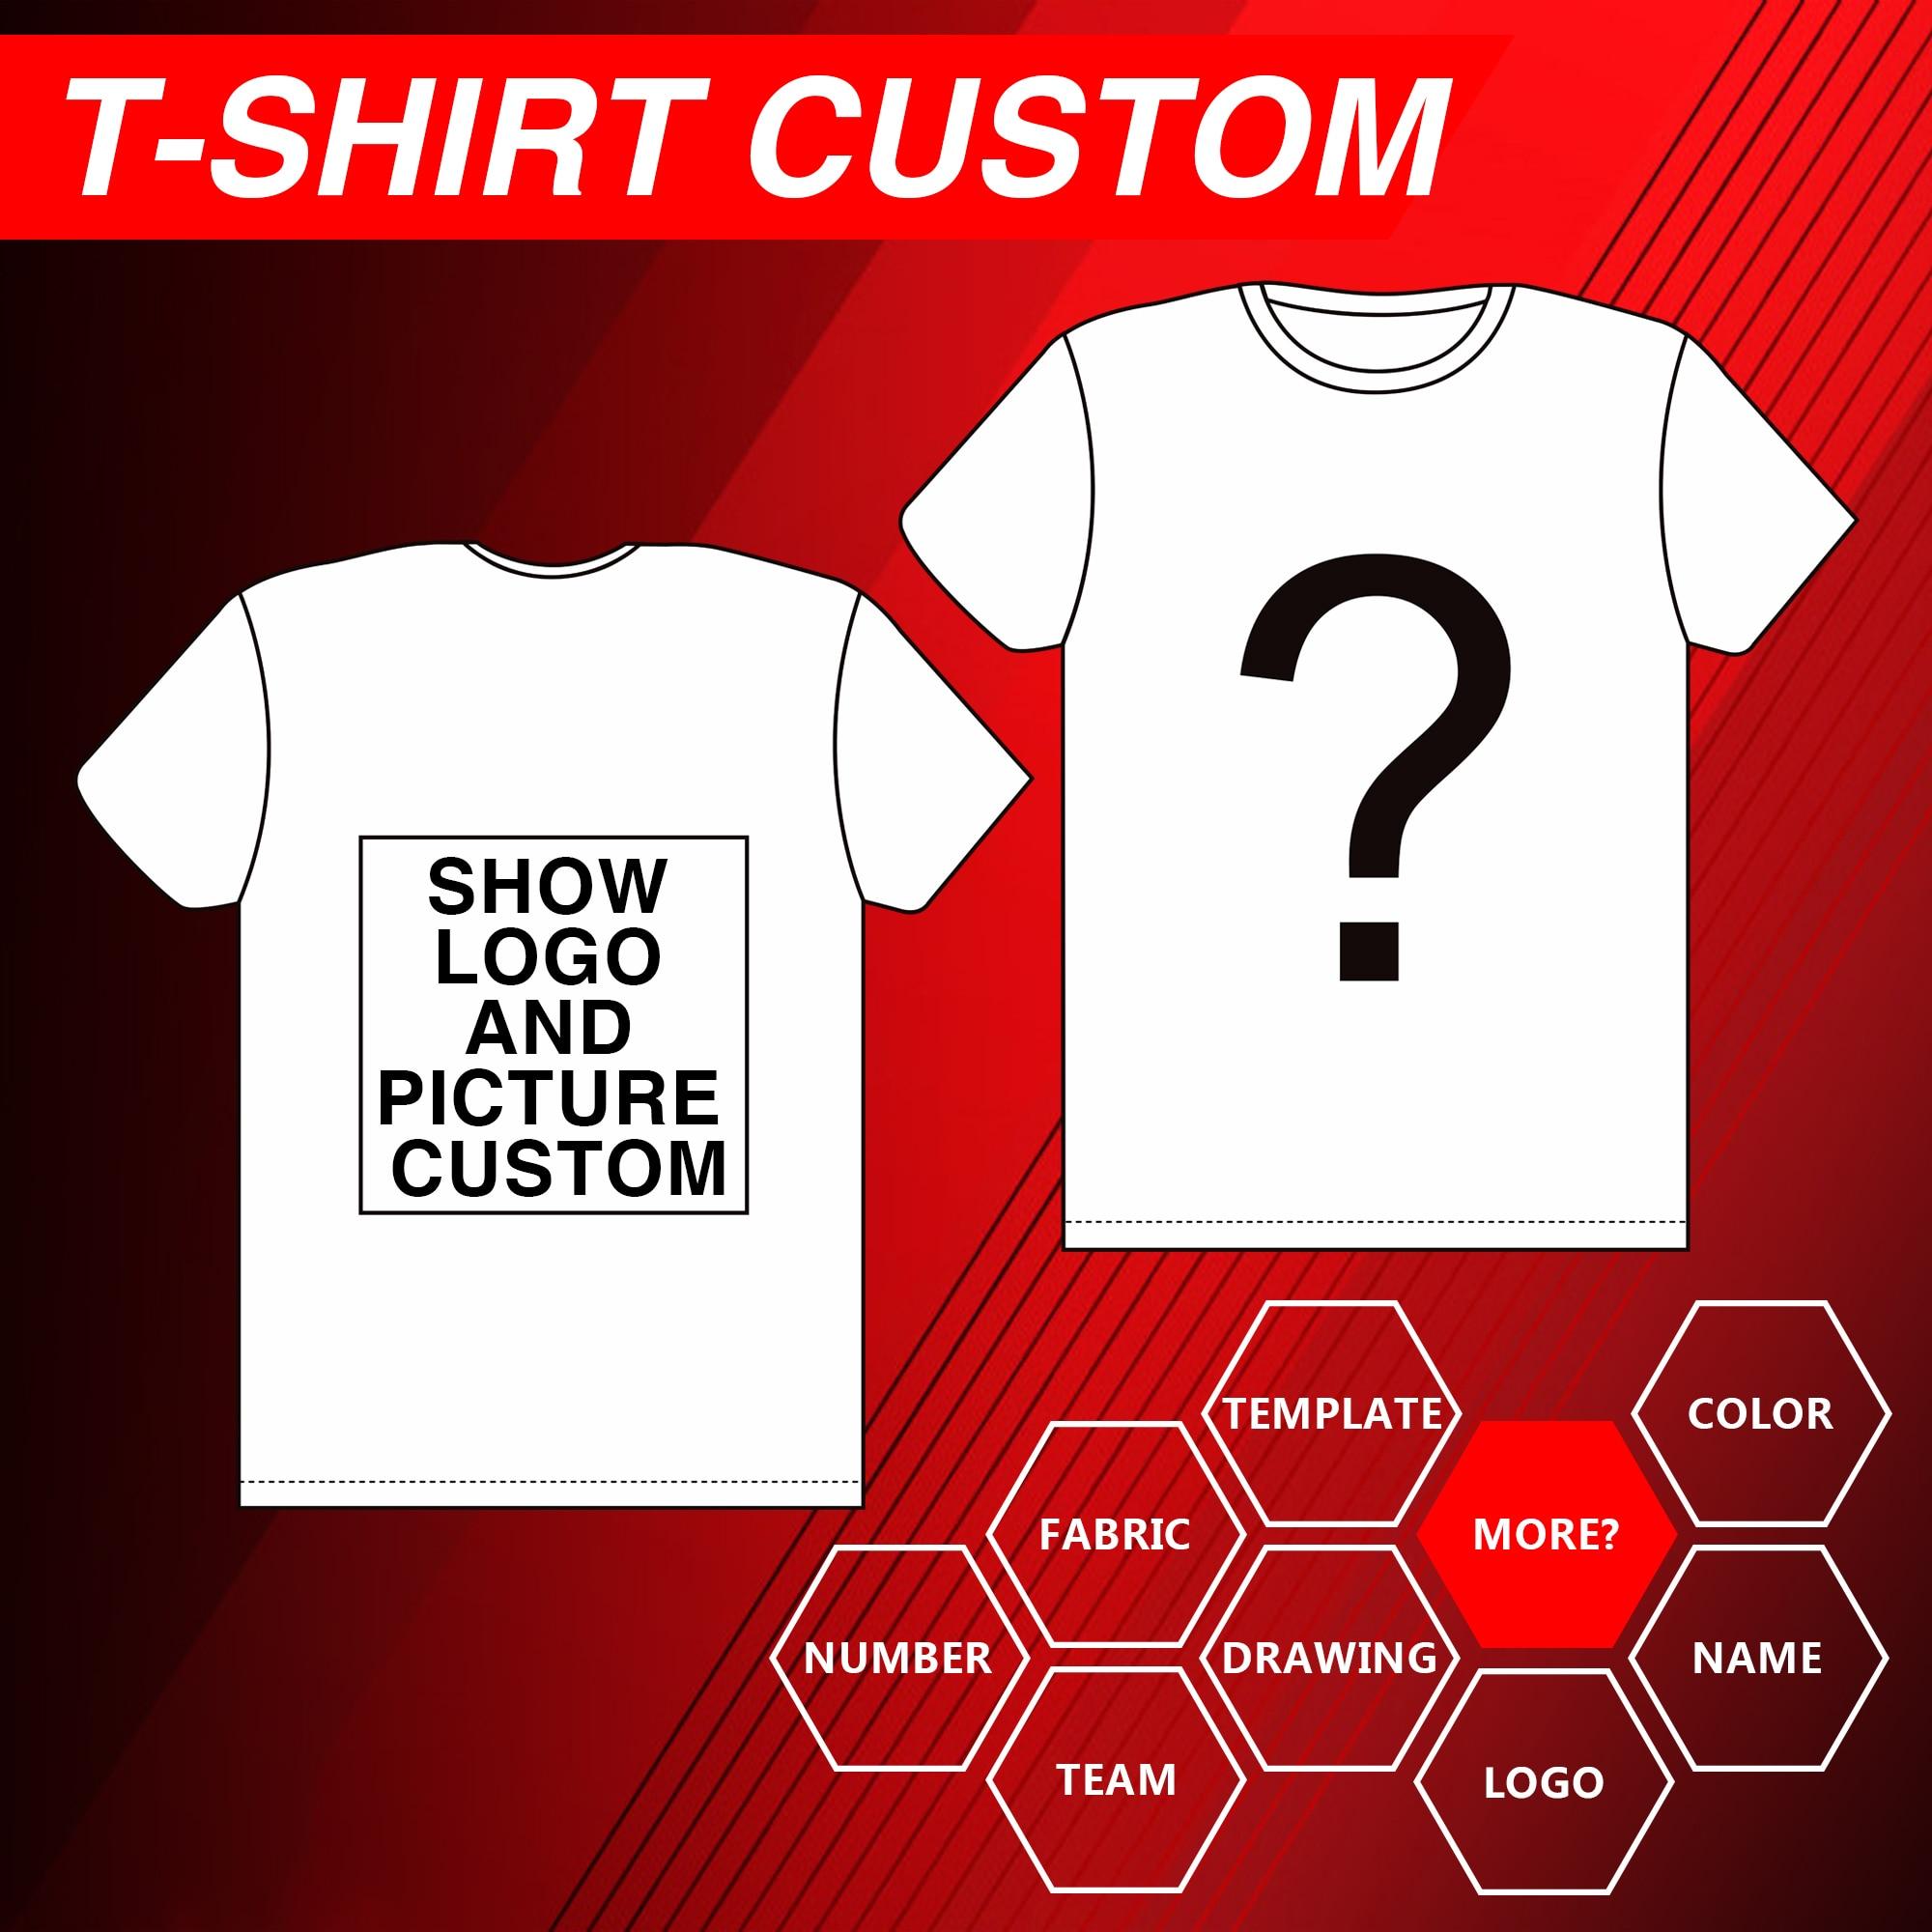 Customized Print T Shirt Women's Girl's DIY Photo Logo Brand Cotton/Polyester shirt Men's Boys clothes Casual Kids Baby's Tshirt